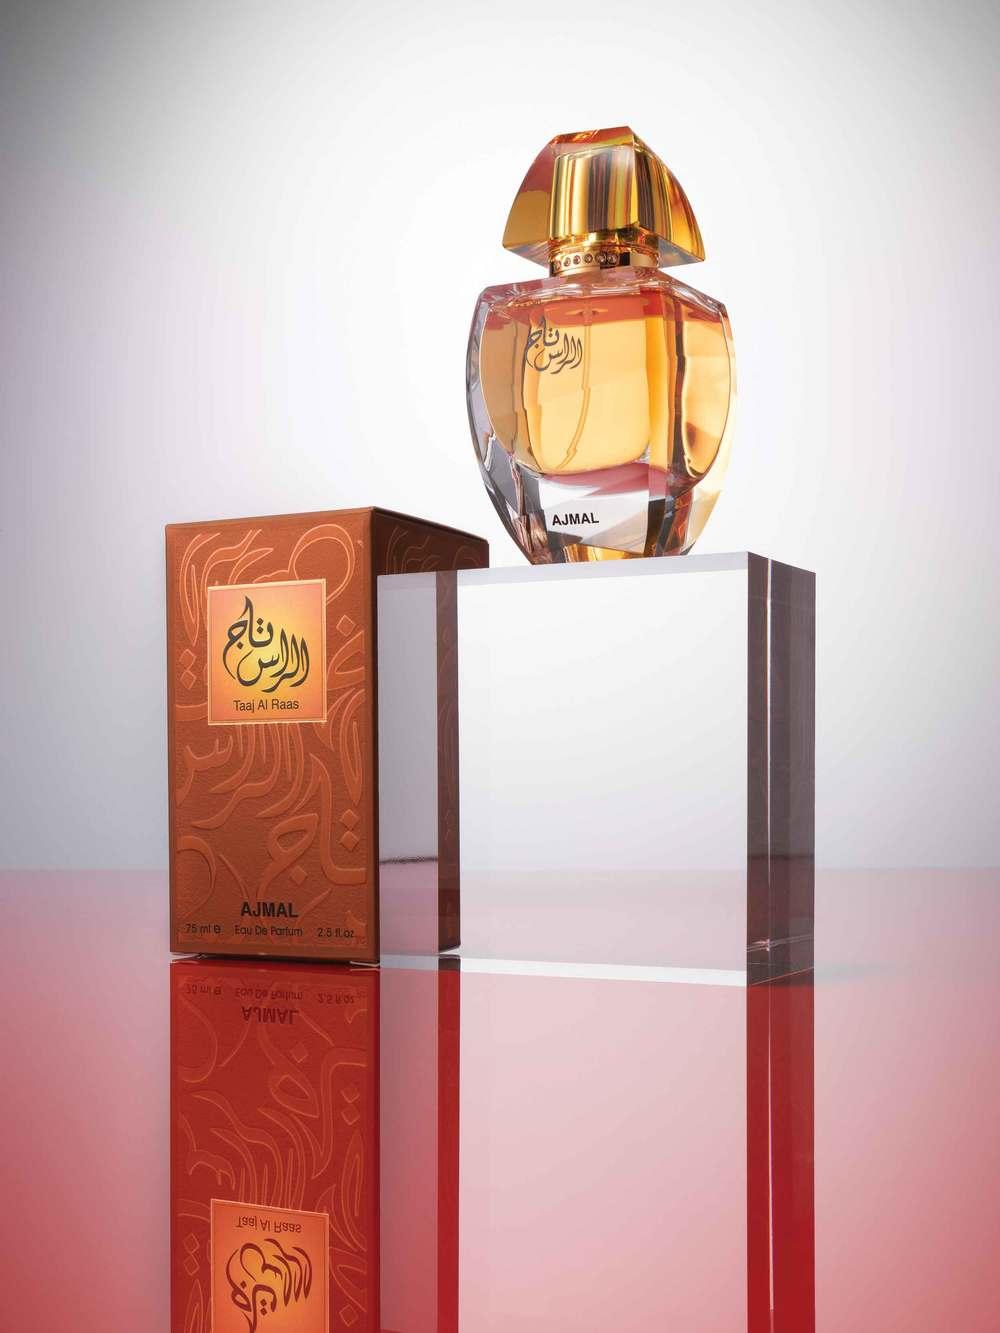 Tamara-Elphick-Ajmal-Fragrance-Perfume